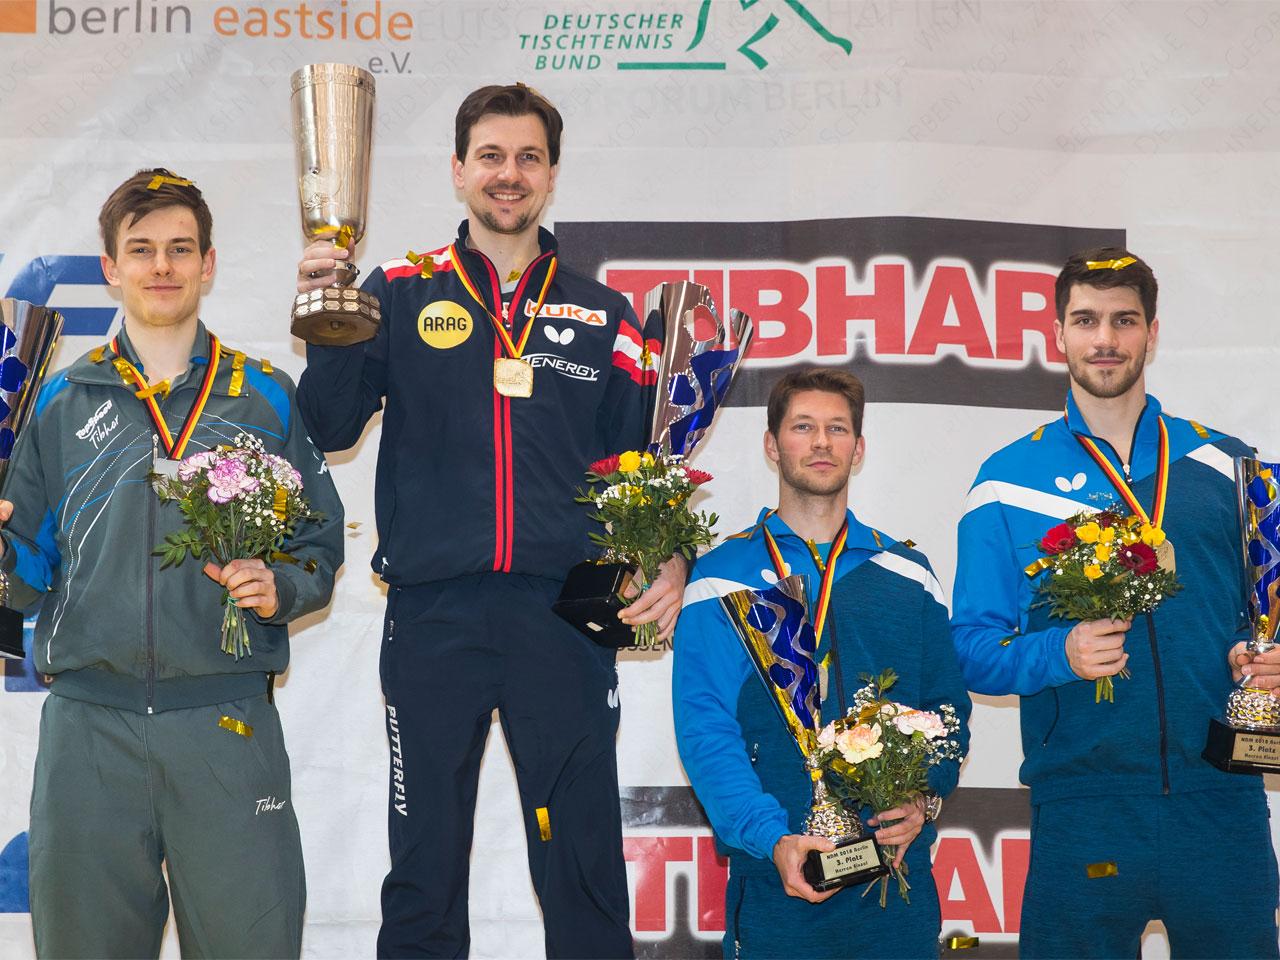 Bronzemedaille Deutsche Meisterschaften 2018 in Berlin